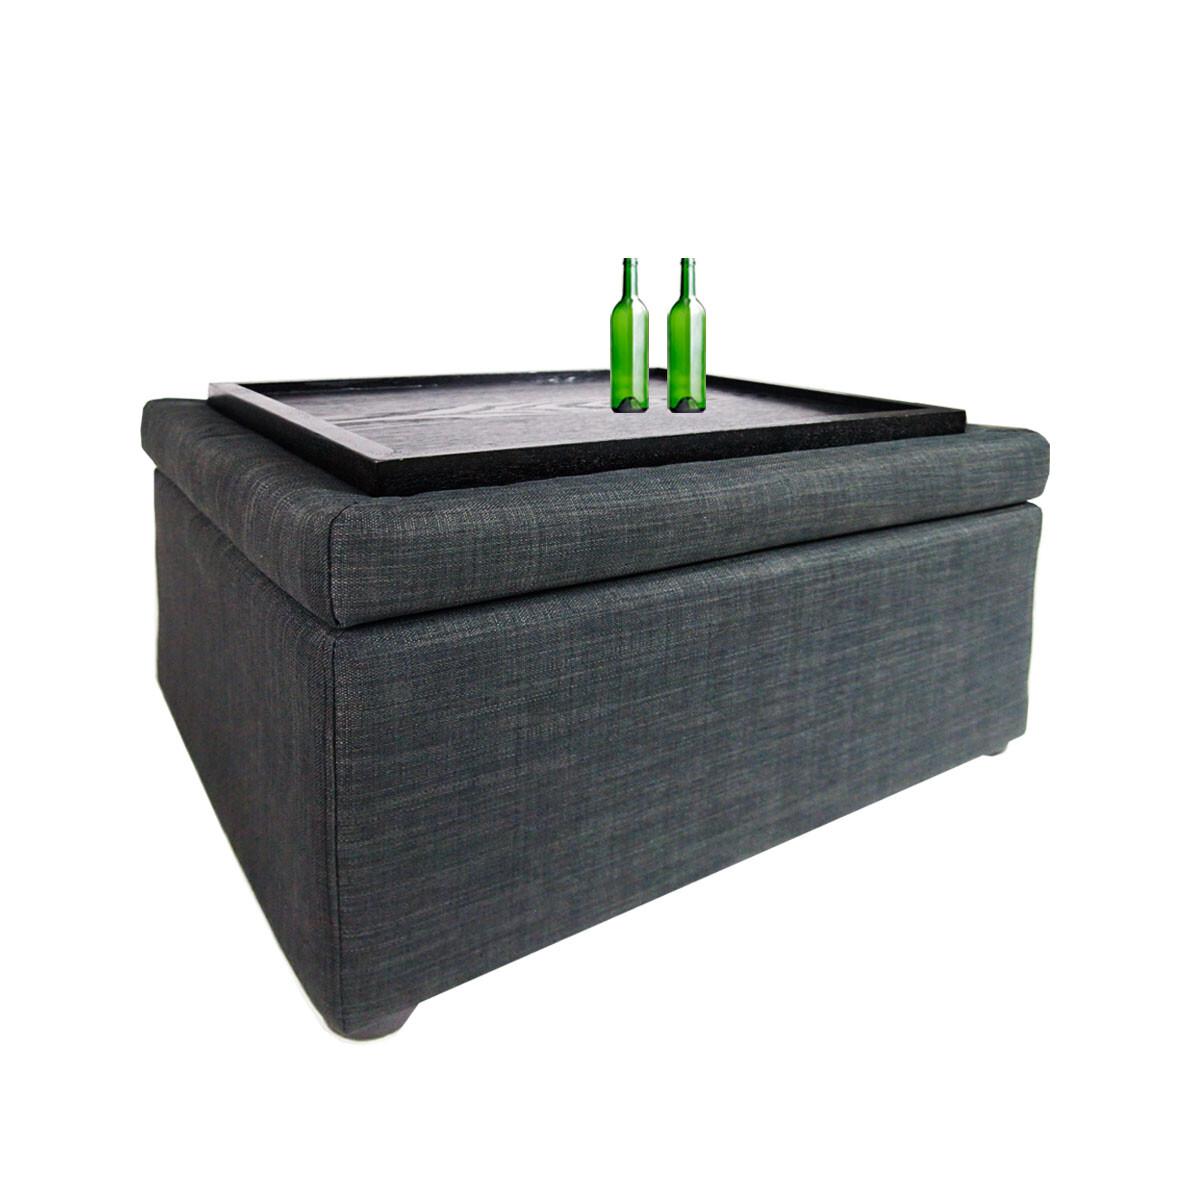 Peachy Ottoman Coffee Table Grey Download Free Architecture Designs Xerocsunscenecom